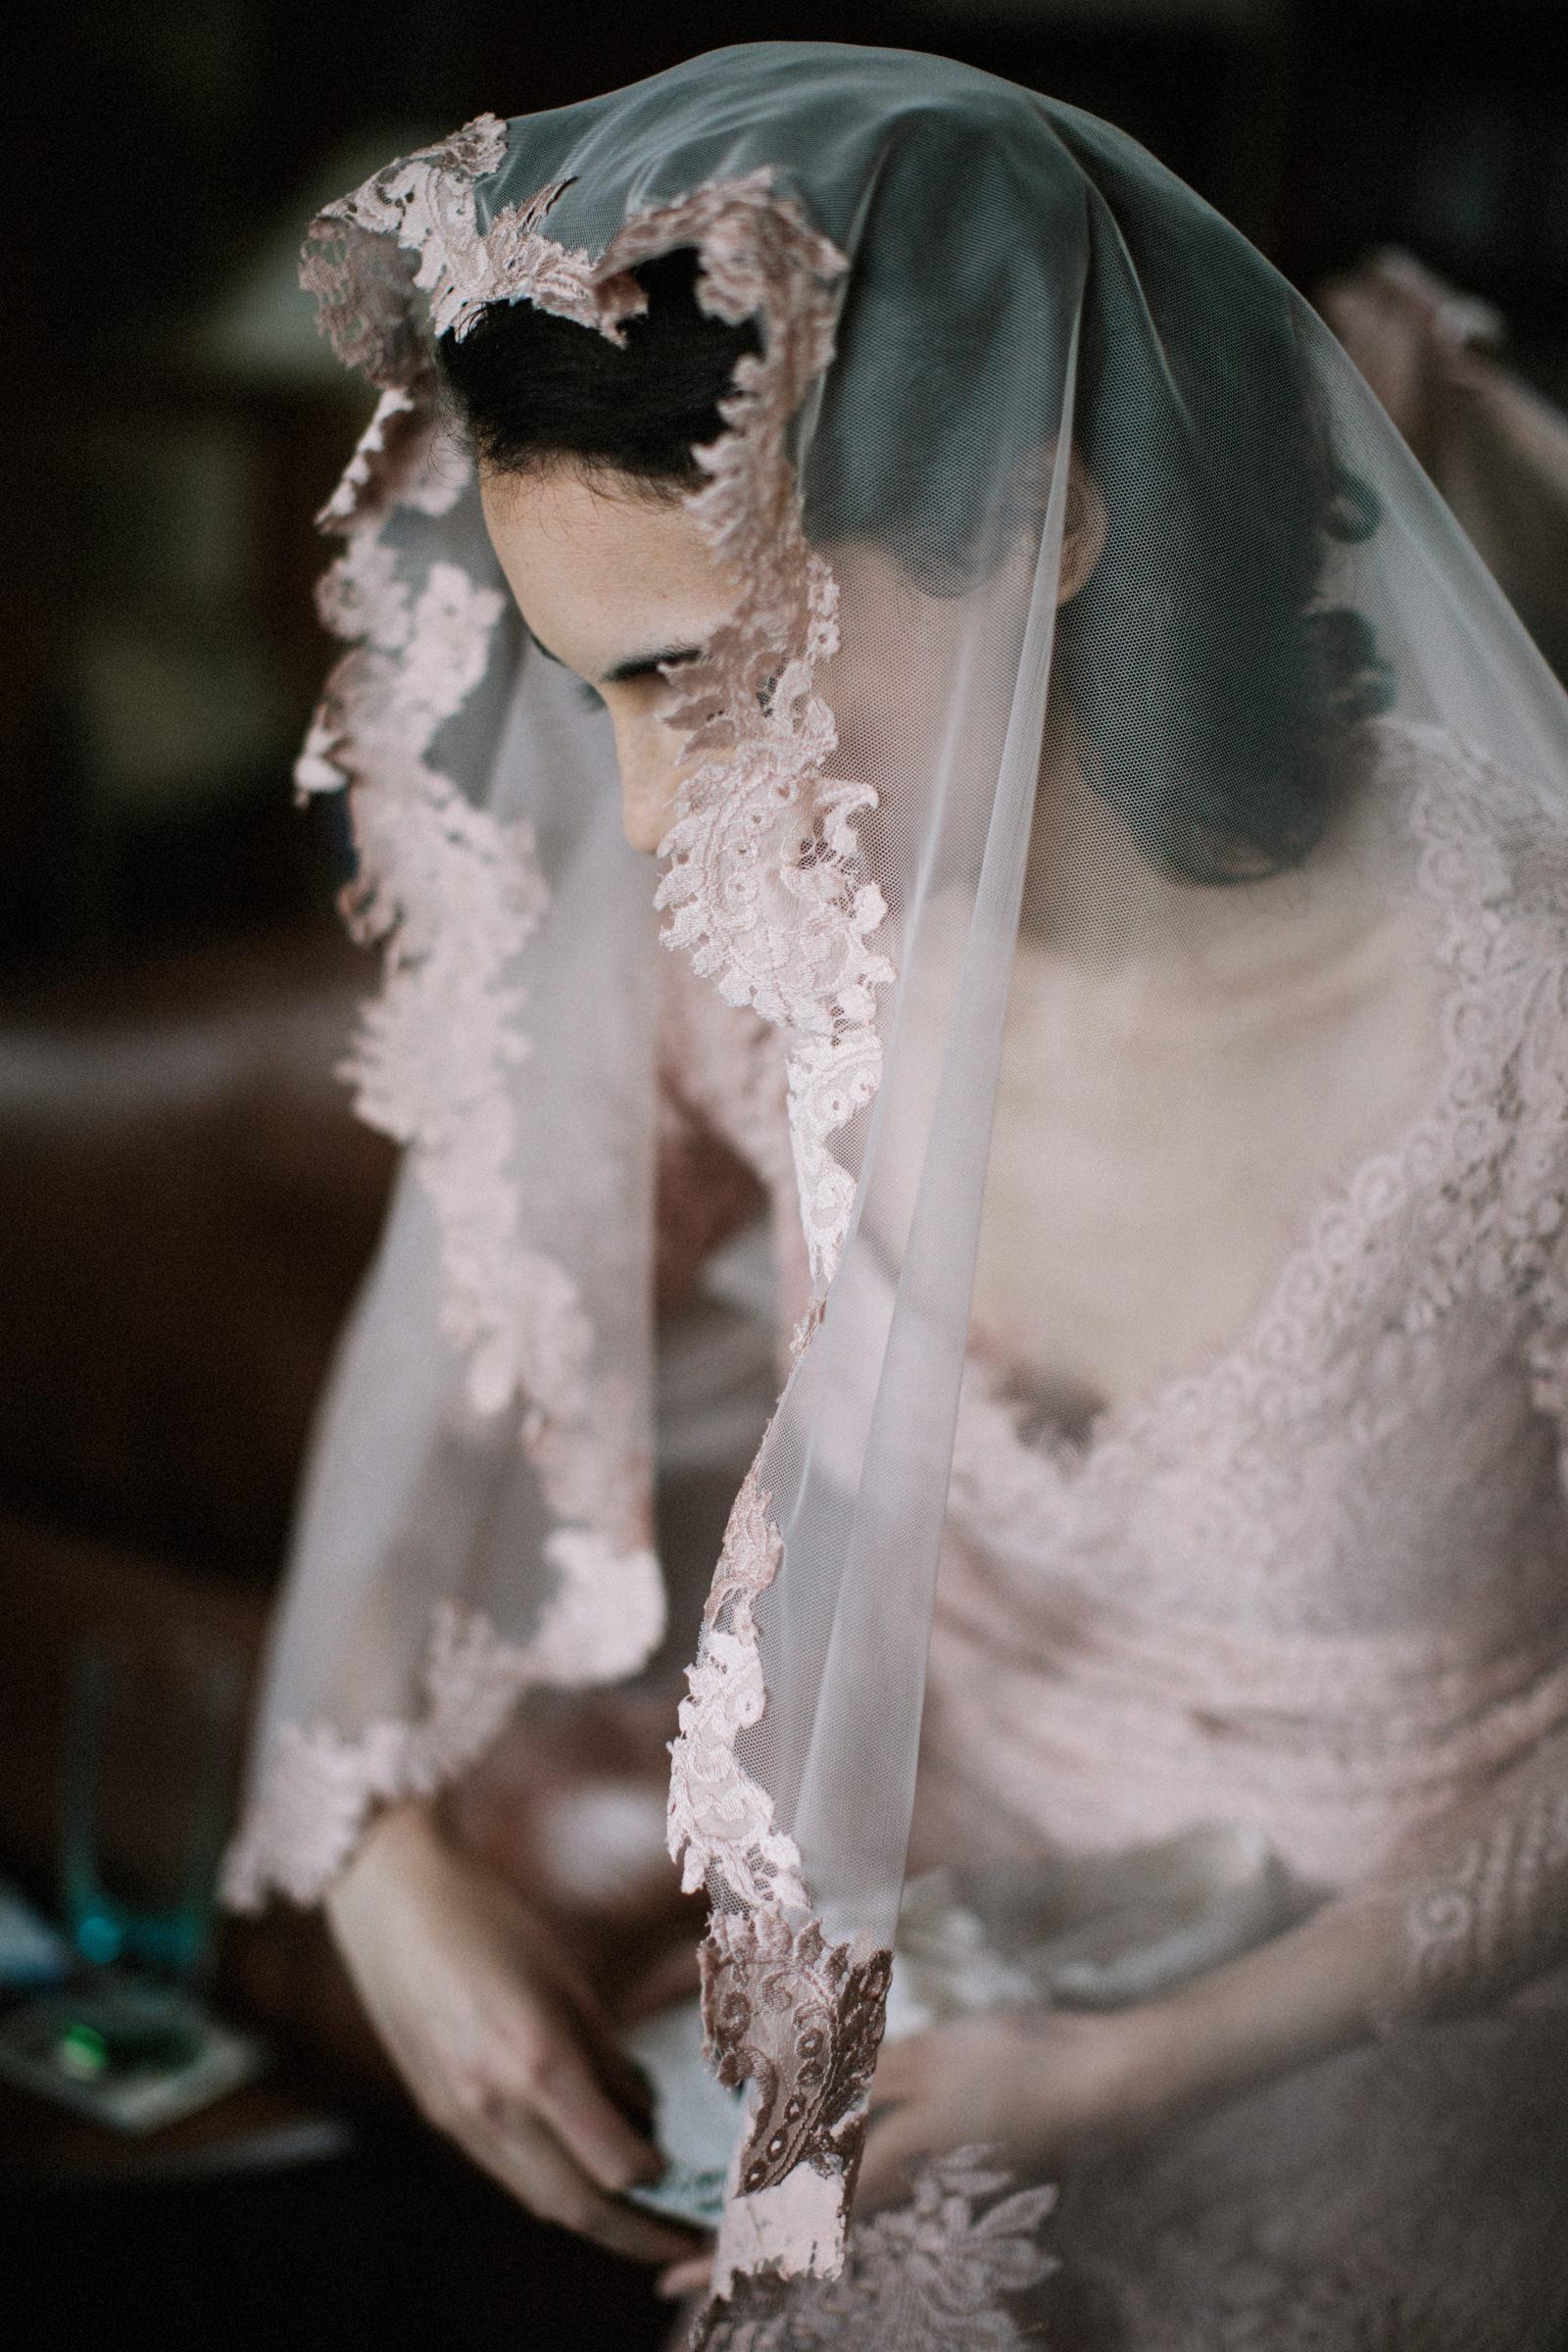 Detail of veiled bride - photo by Jonas Seaman Photography